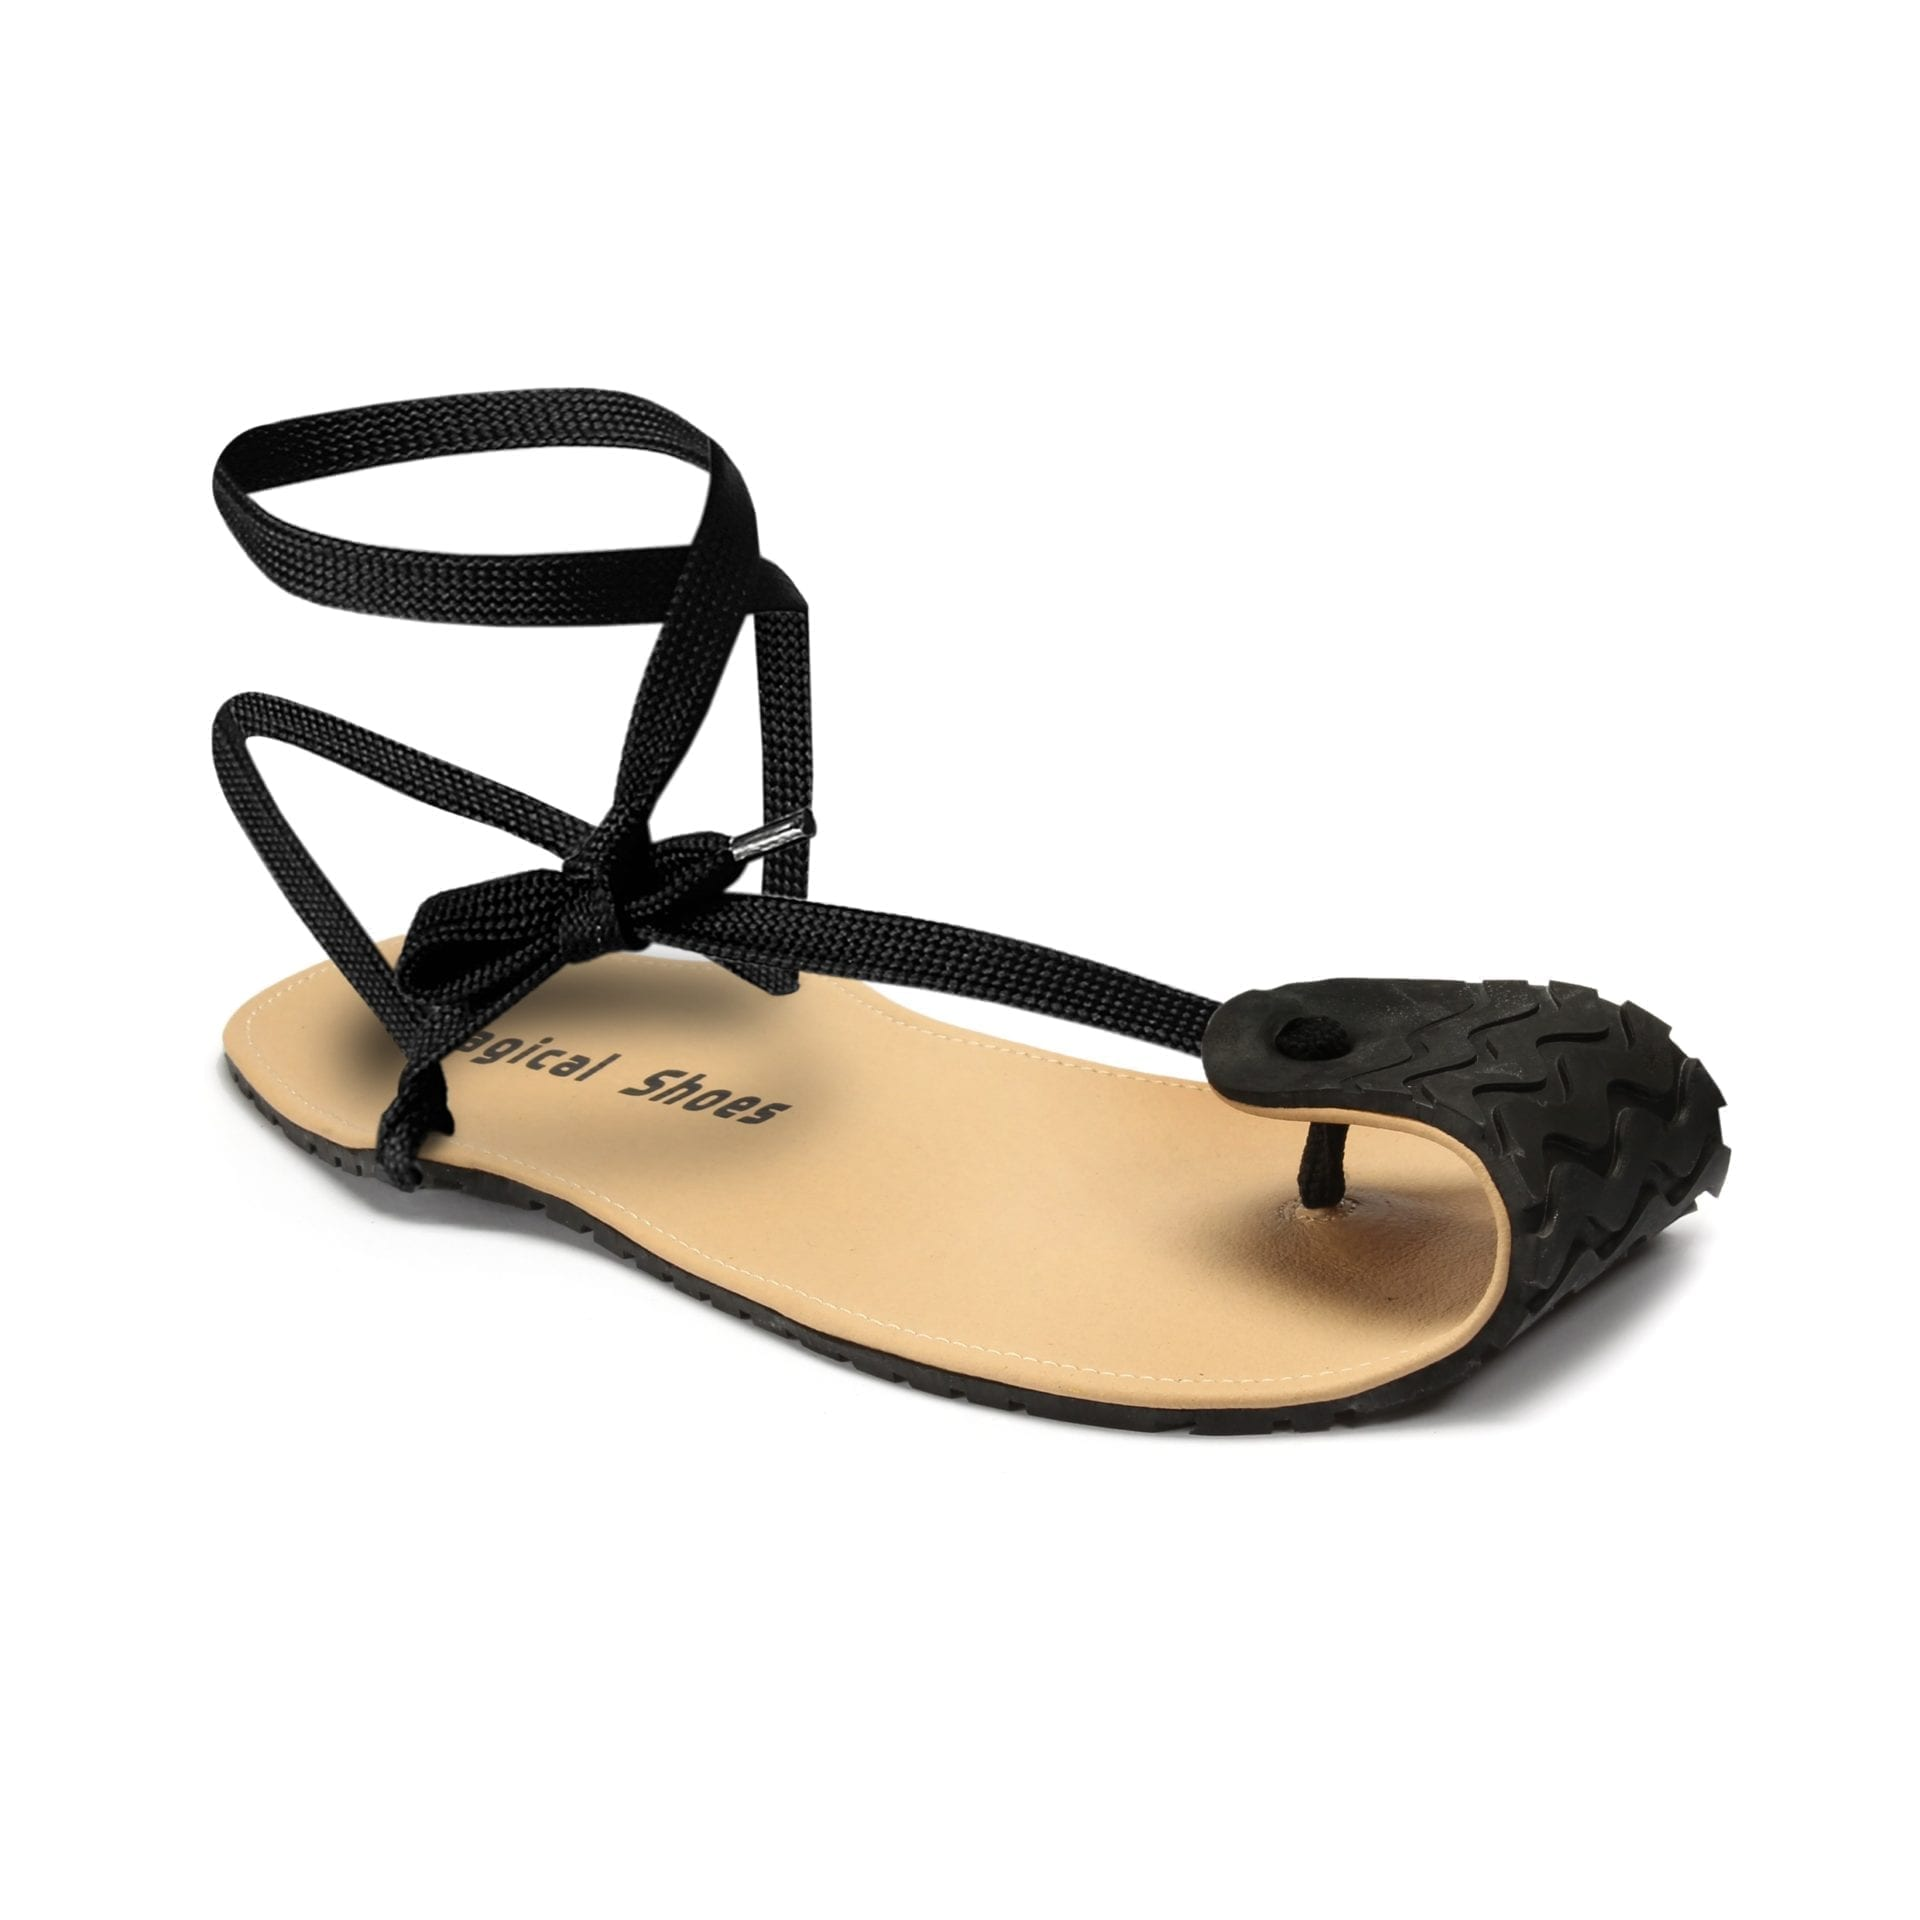 Magical Shoes CABALLO BLANCO- HUARACHE SANDALS picture 2